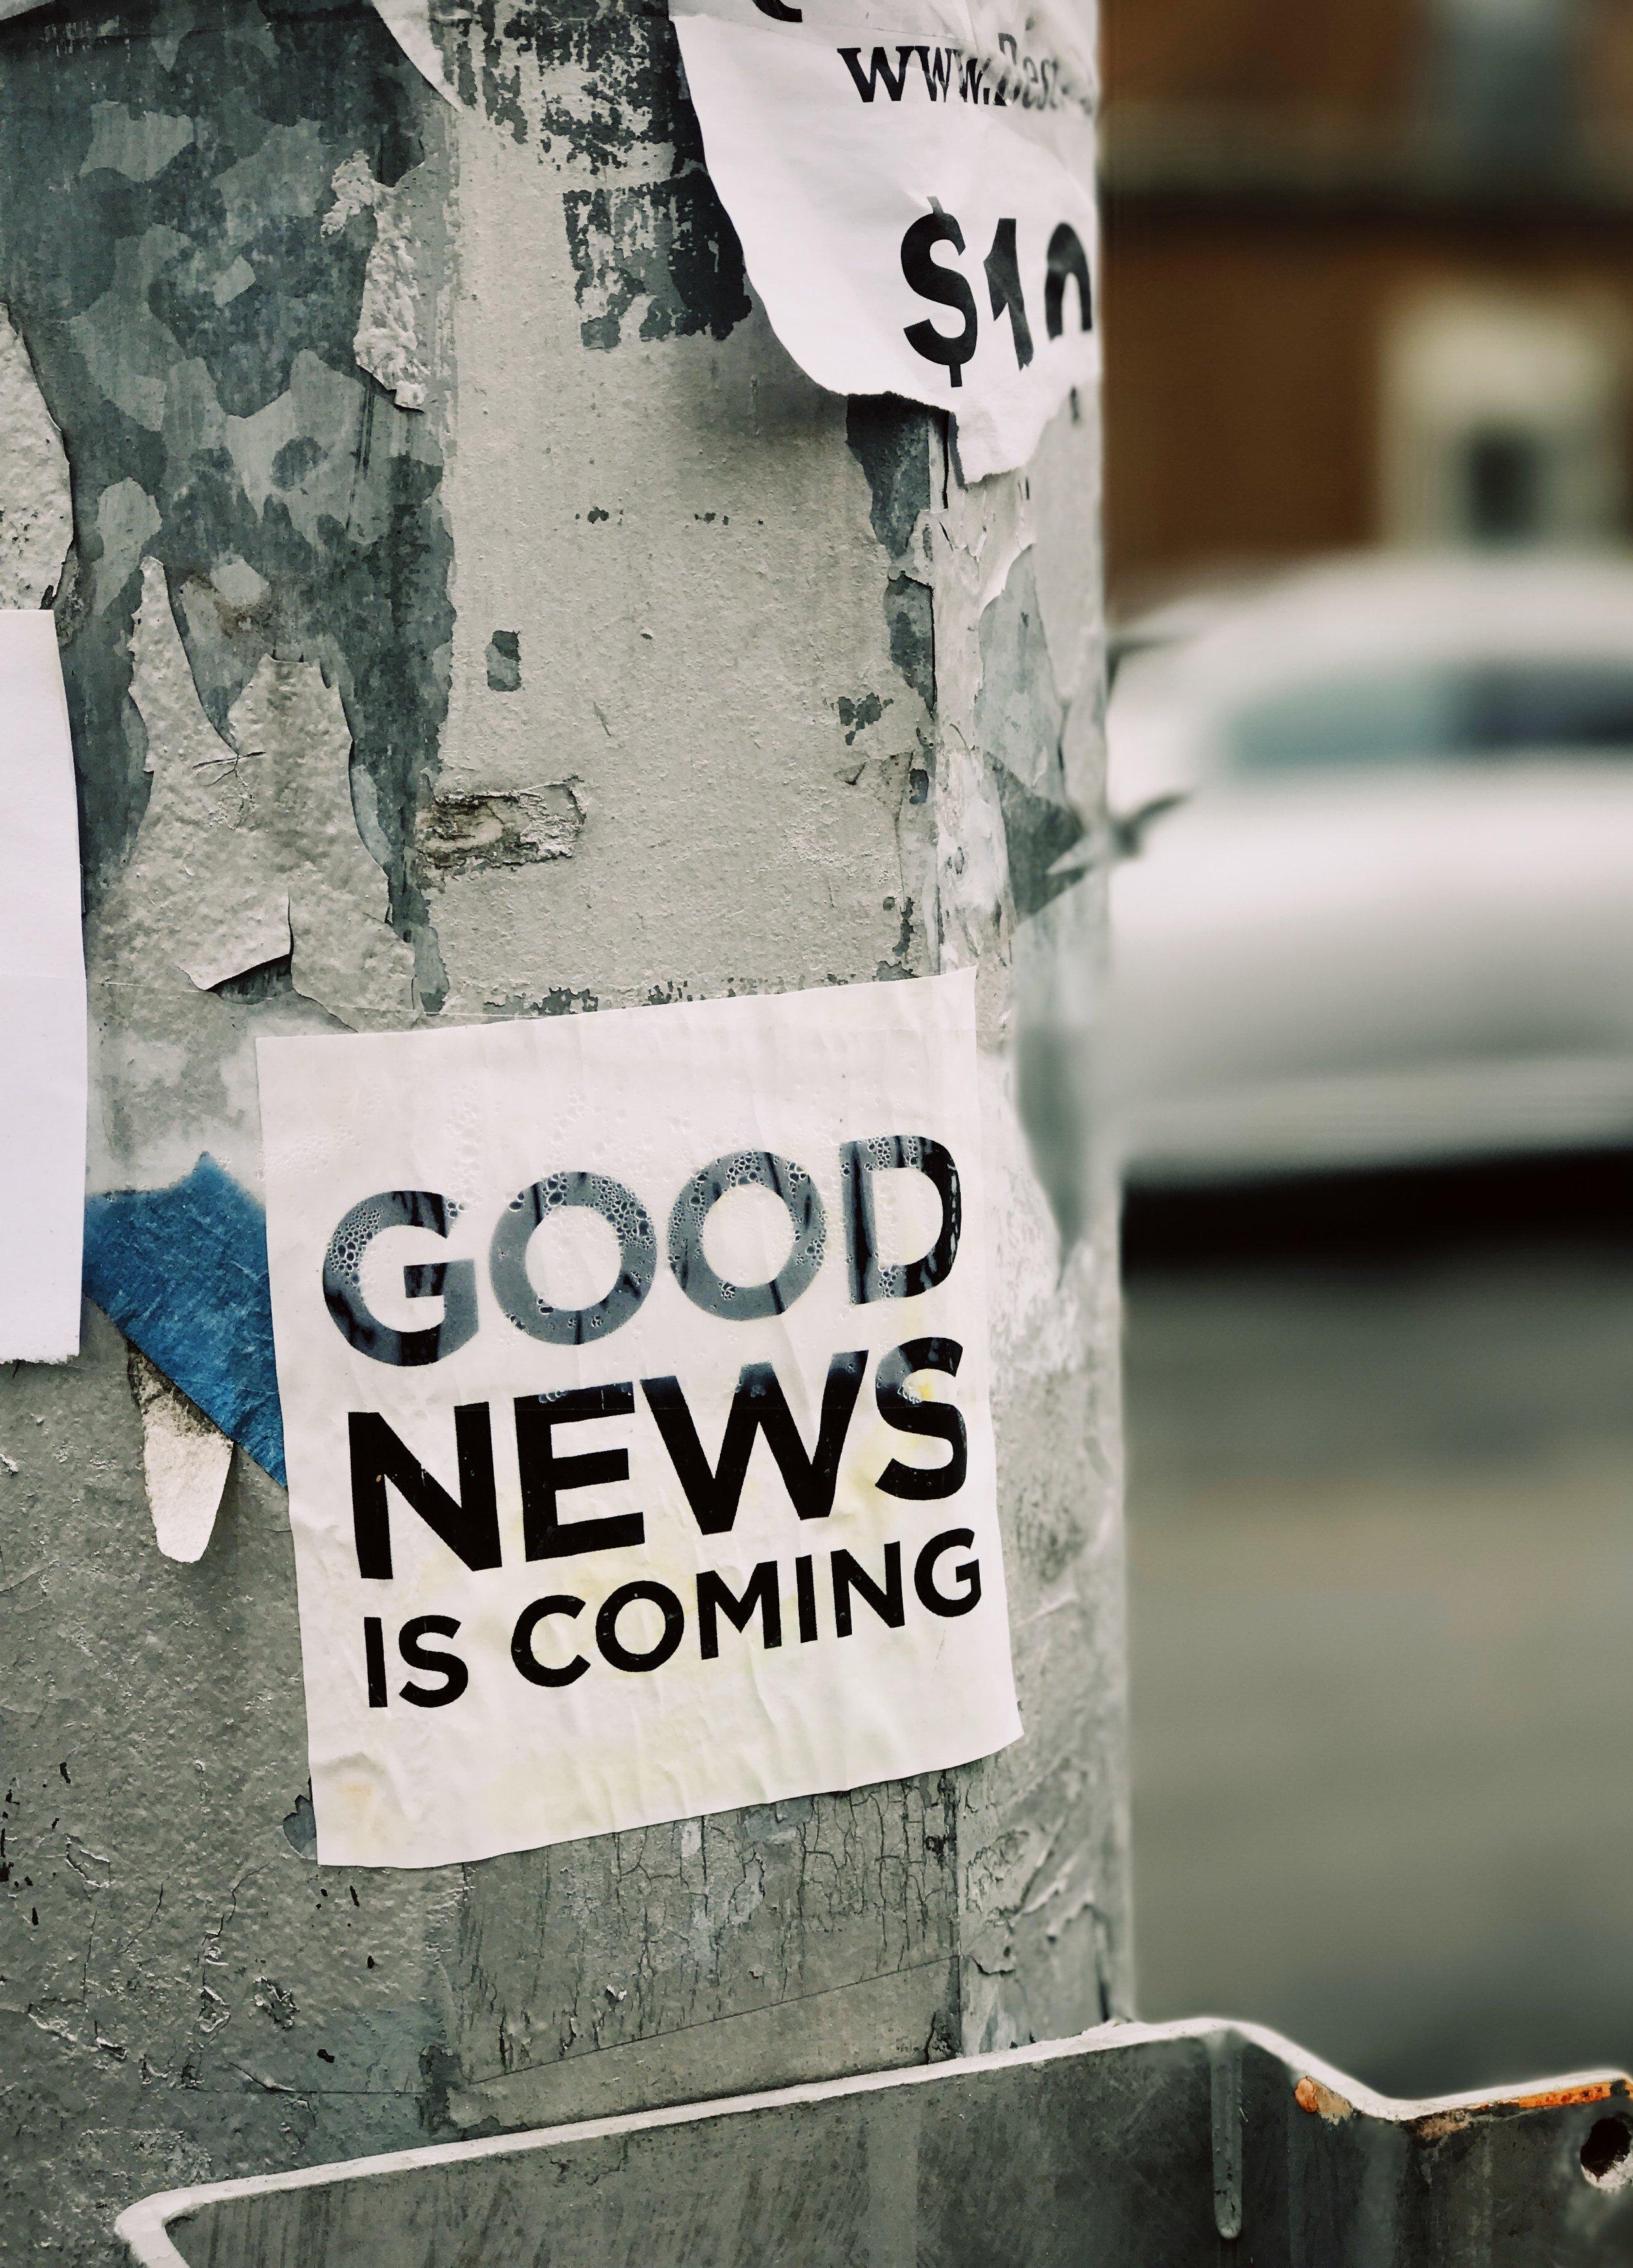 e-newsletters -